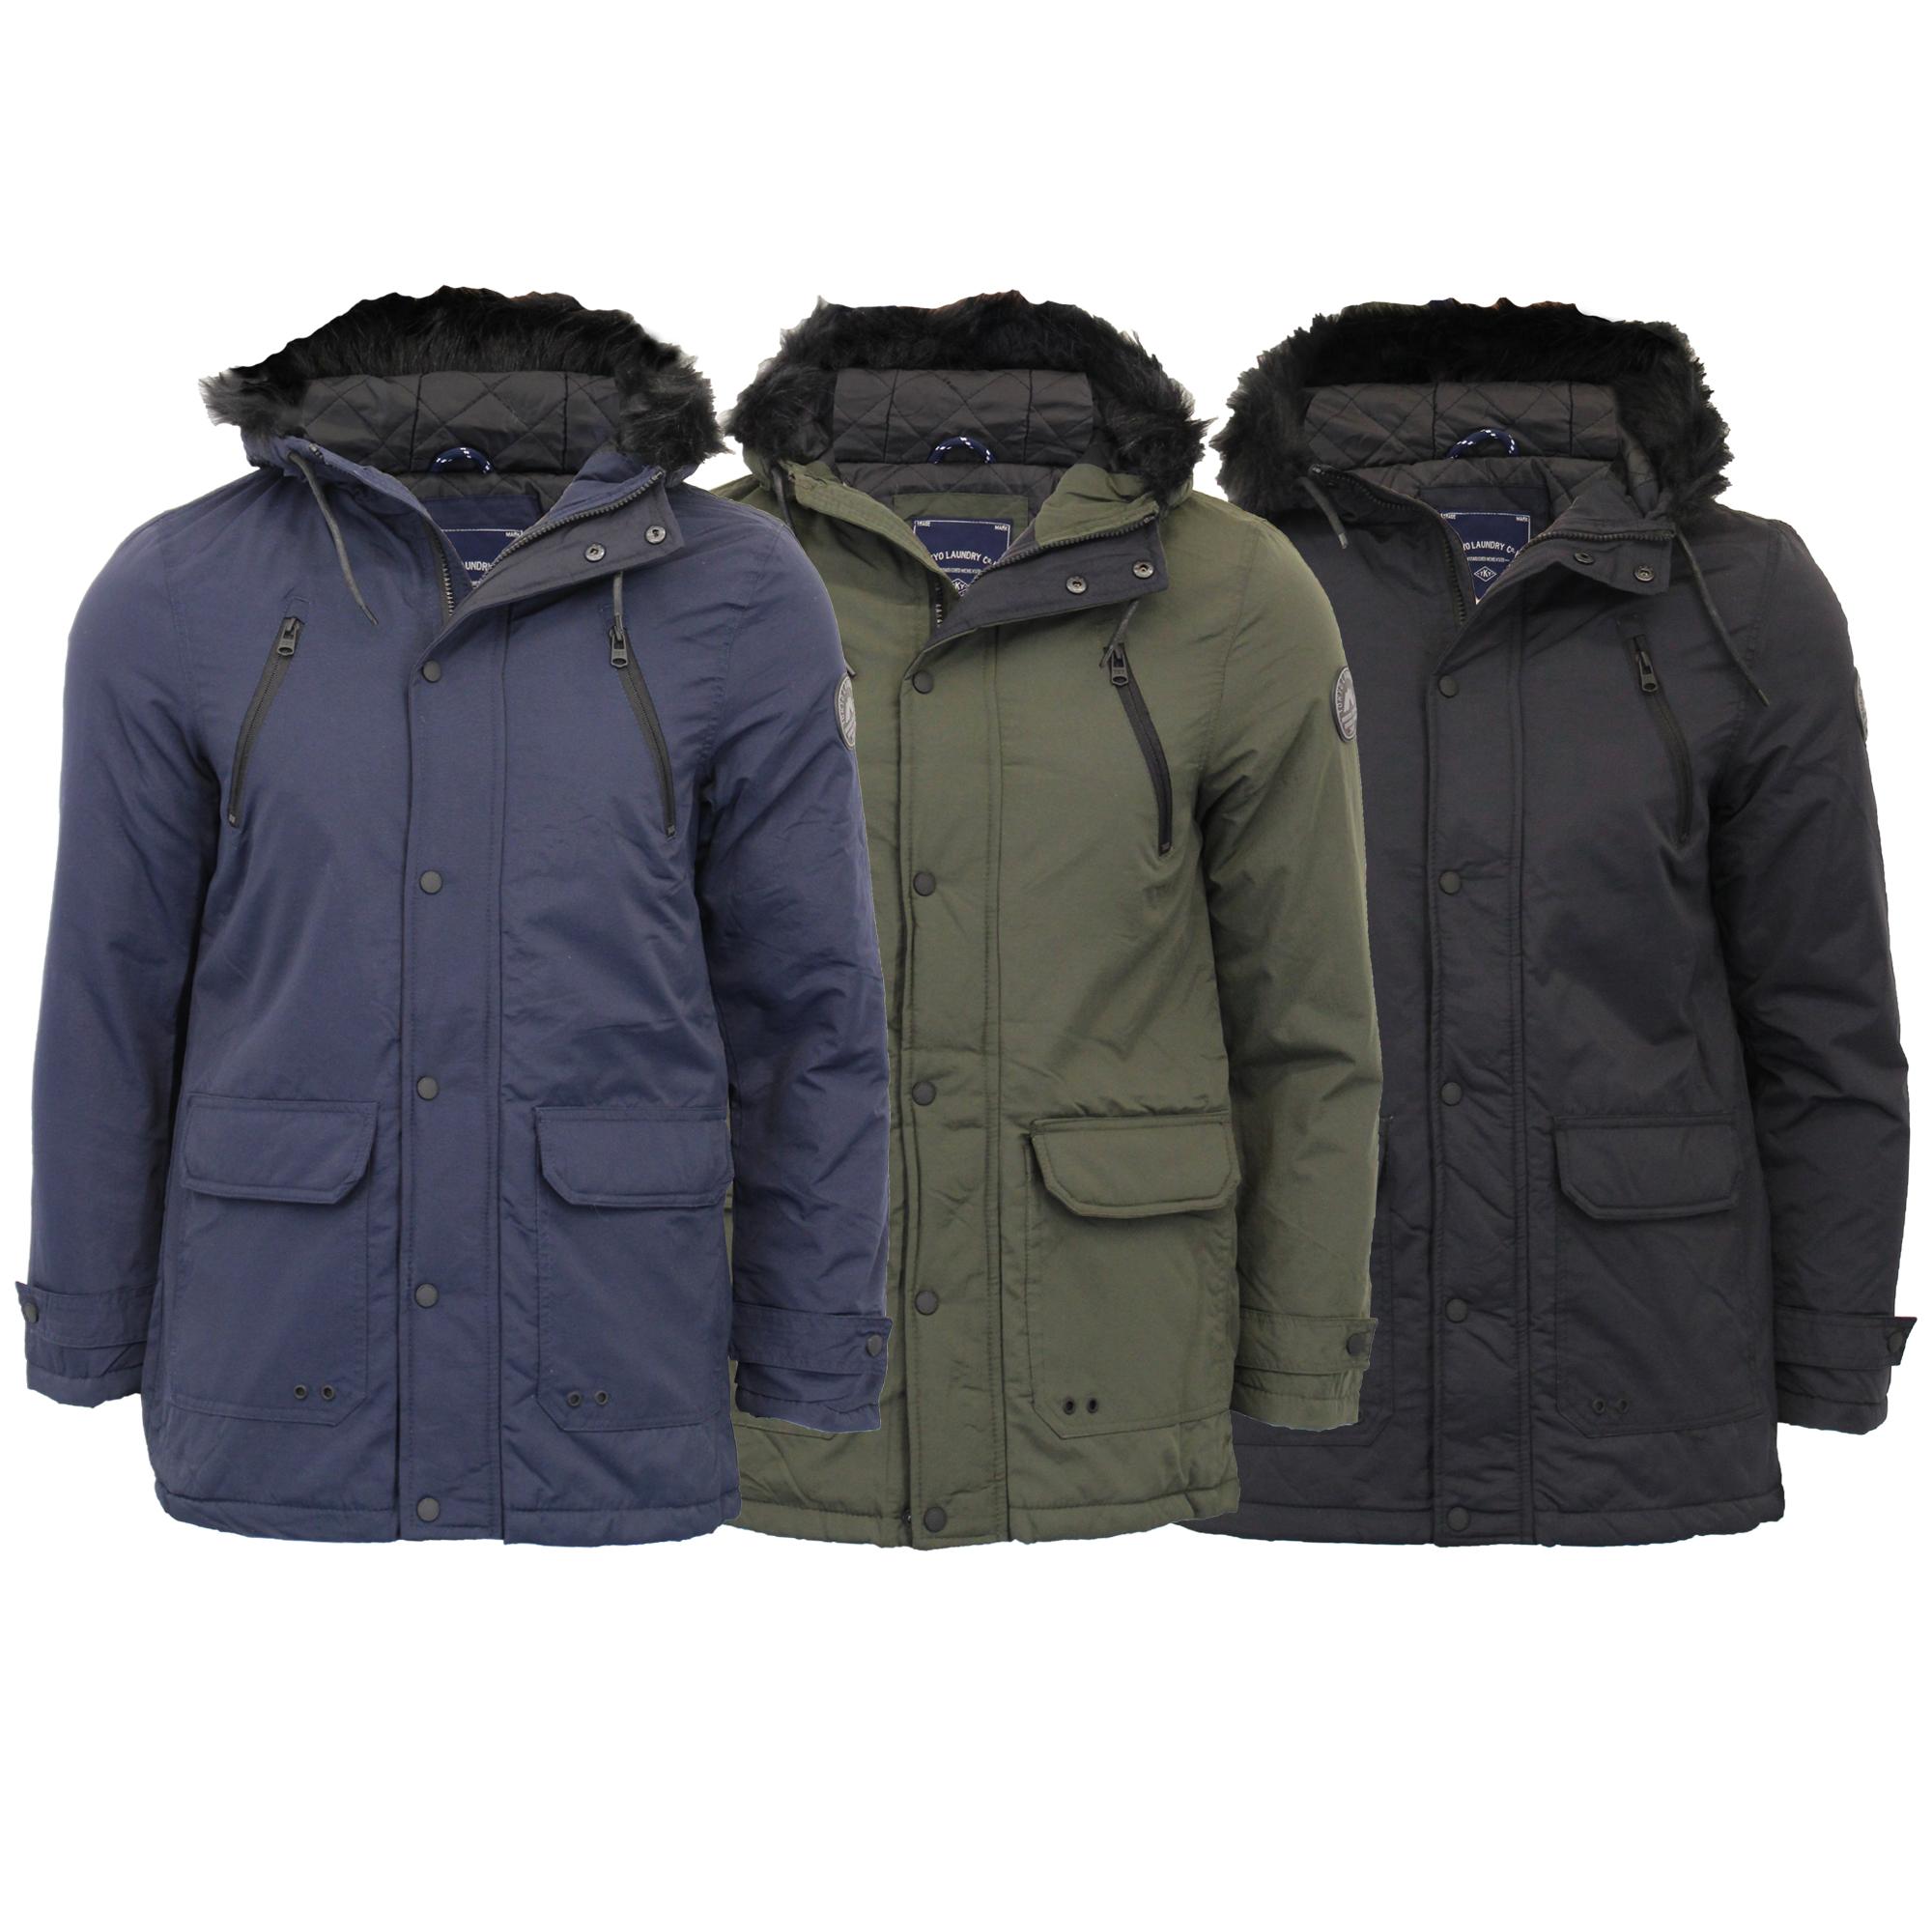 Mens Parka Jacket Tokyo Laundry Coat Hoodie Padded LENART Warm Winter Lined New